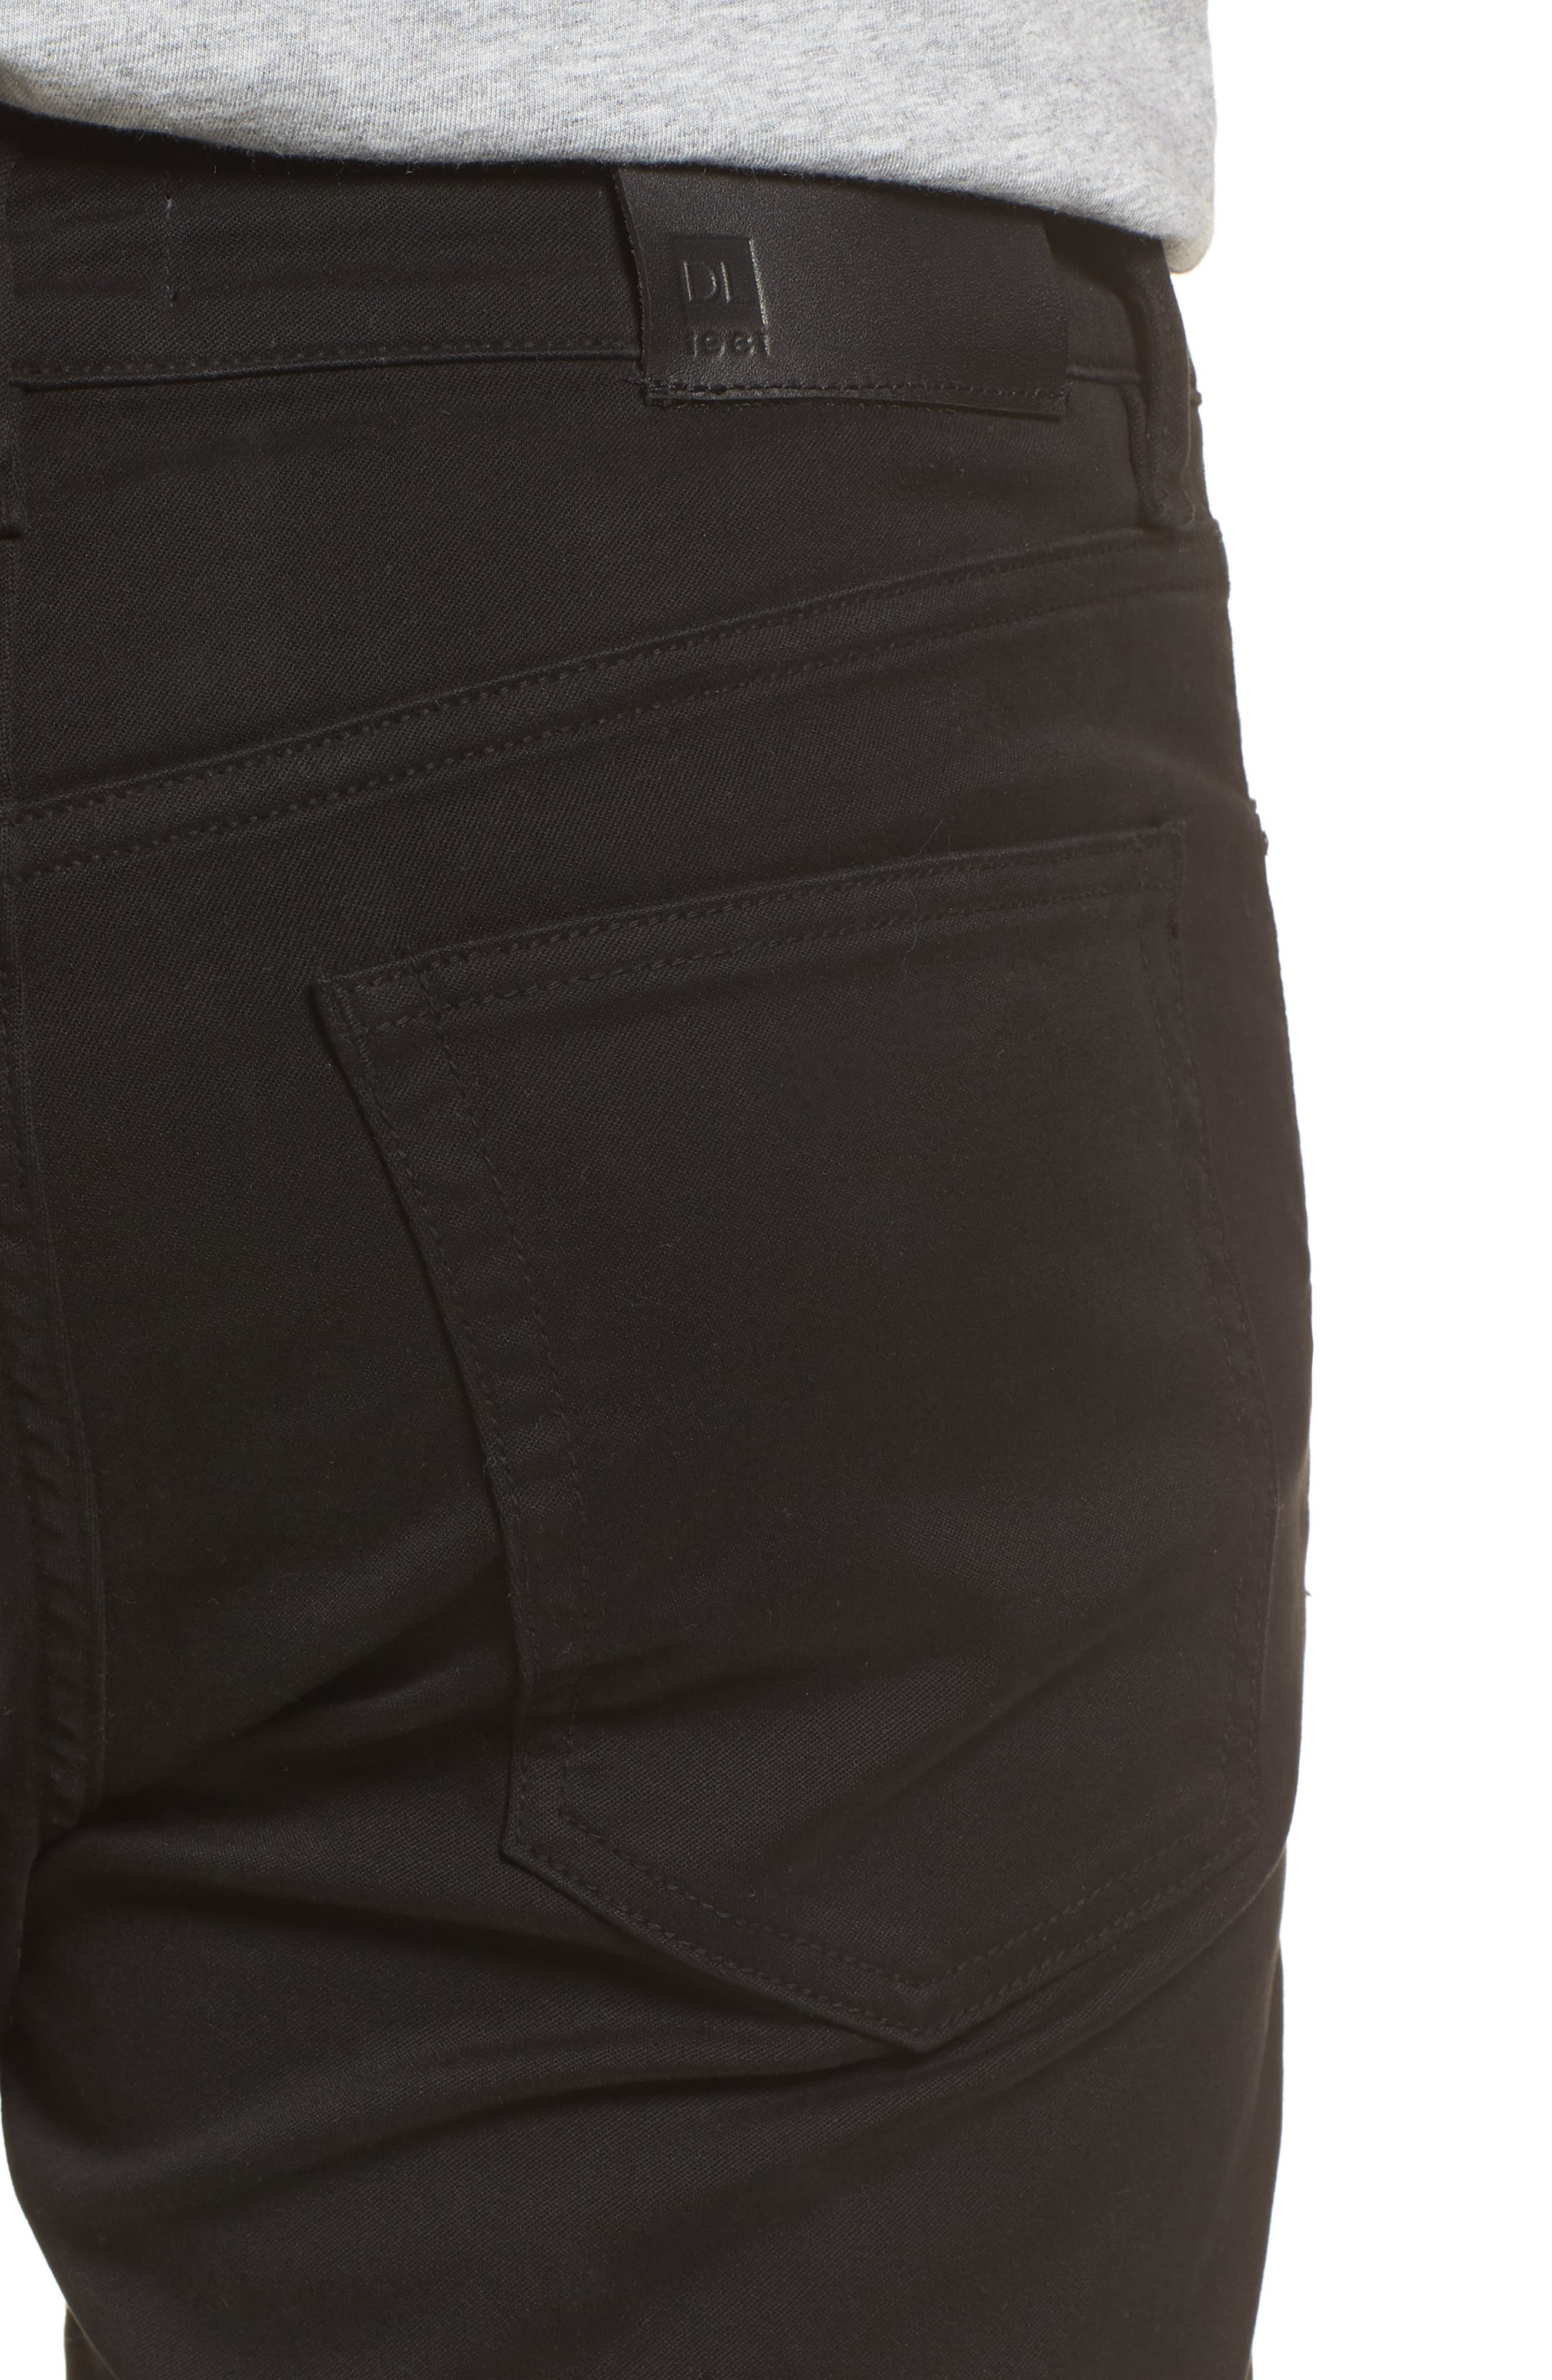 Avery Slim Straight Chino Pants,                             Alternate thumbnail 4, color,                             COAL